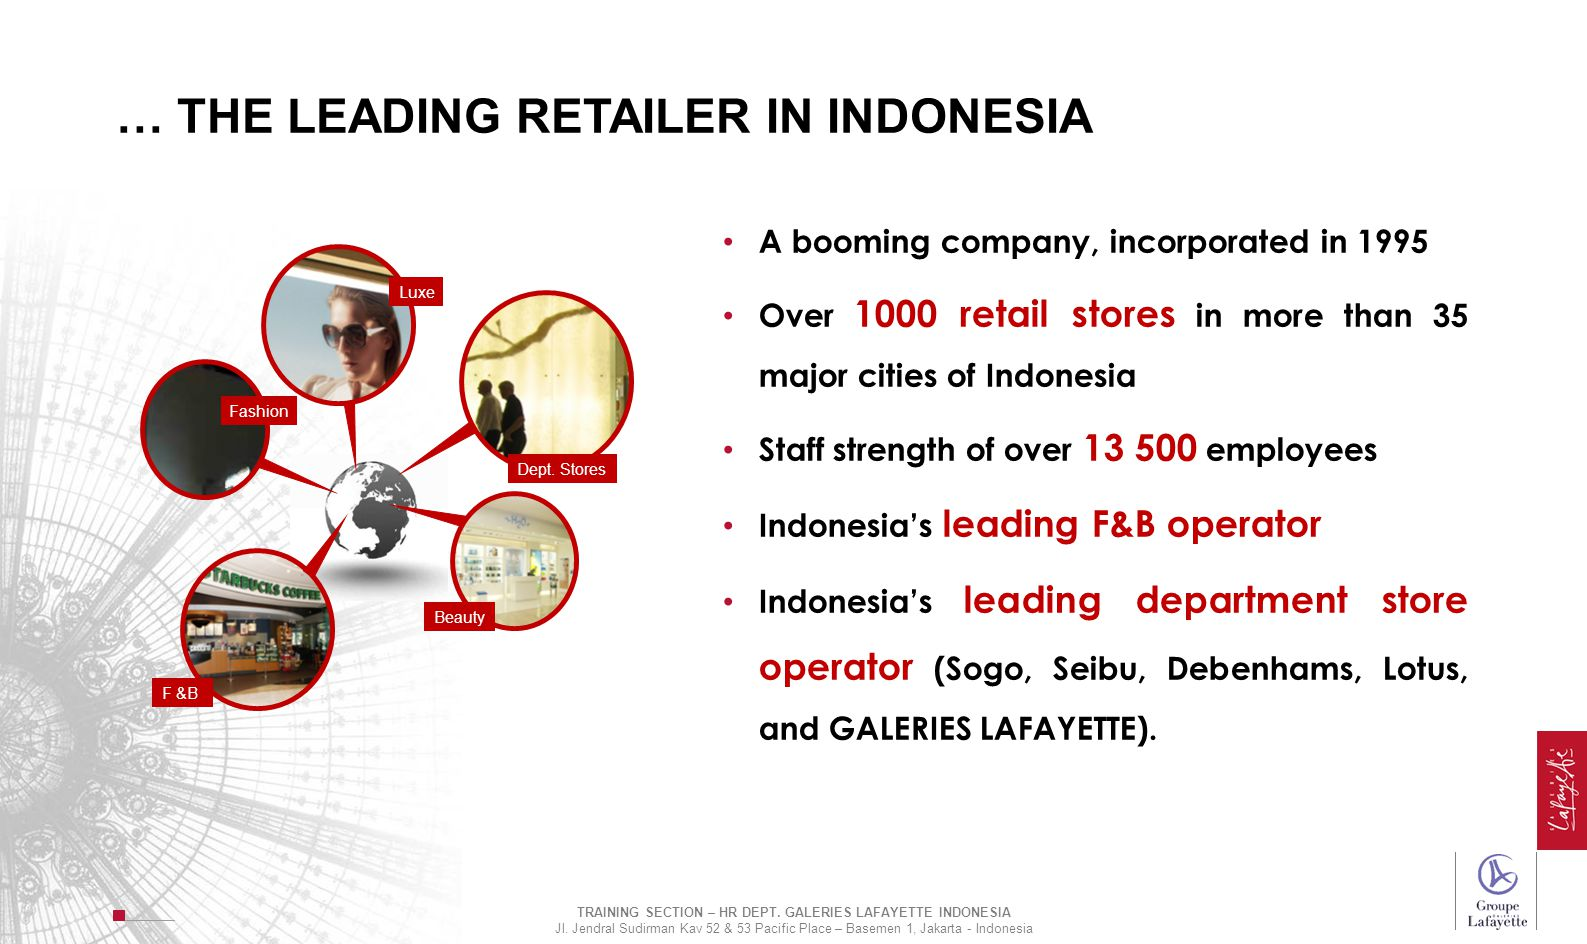 TRAINING SECTION – HR DEPT.GALERIES LAFAYETTE INDONESIA Jl.